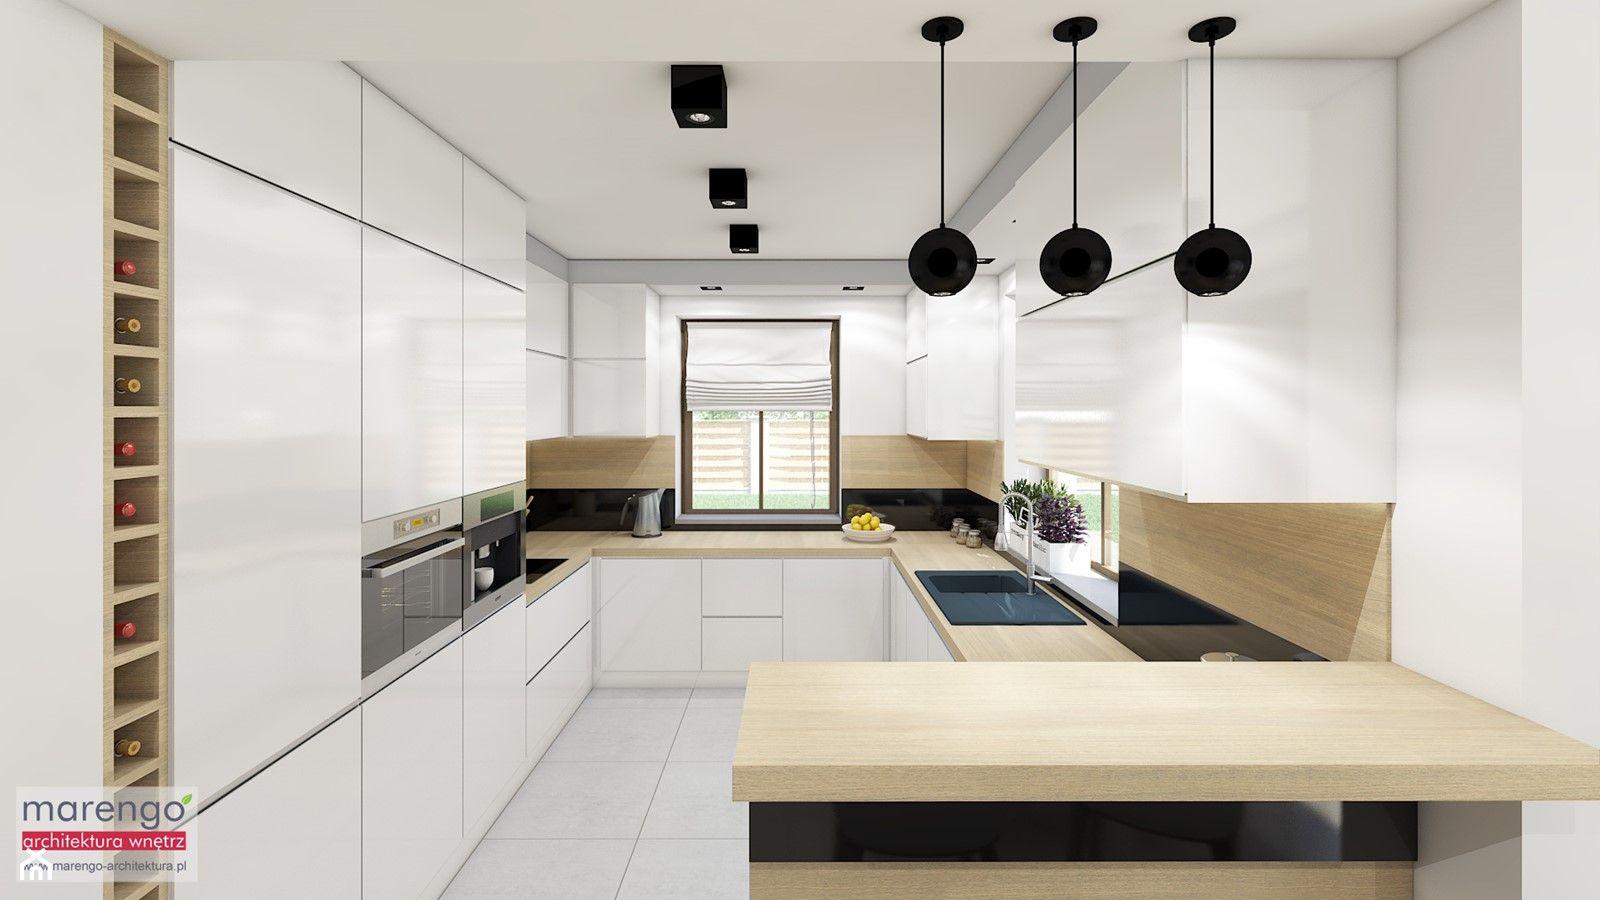 Kuchnia W Ksztalcie Litery U Aranzacje Pomysly Inspiracje Homebook Kitchen Room Design Kitchen Room Kitchen